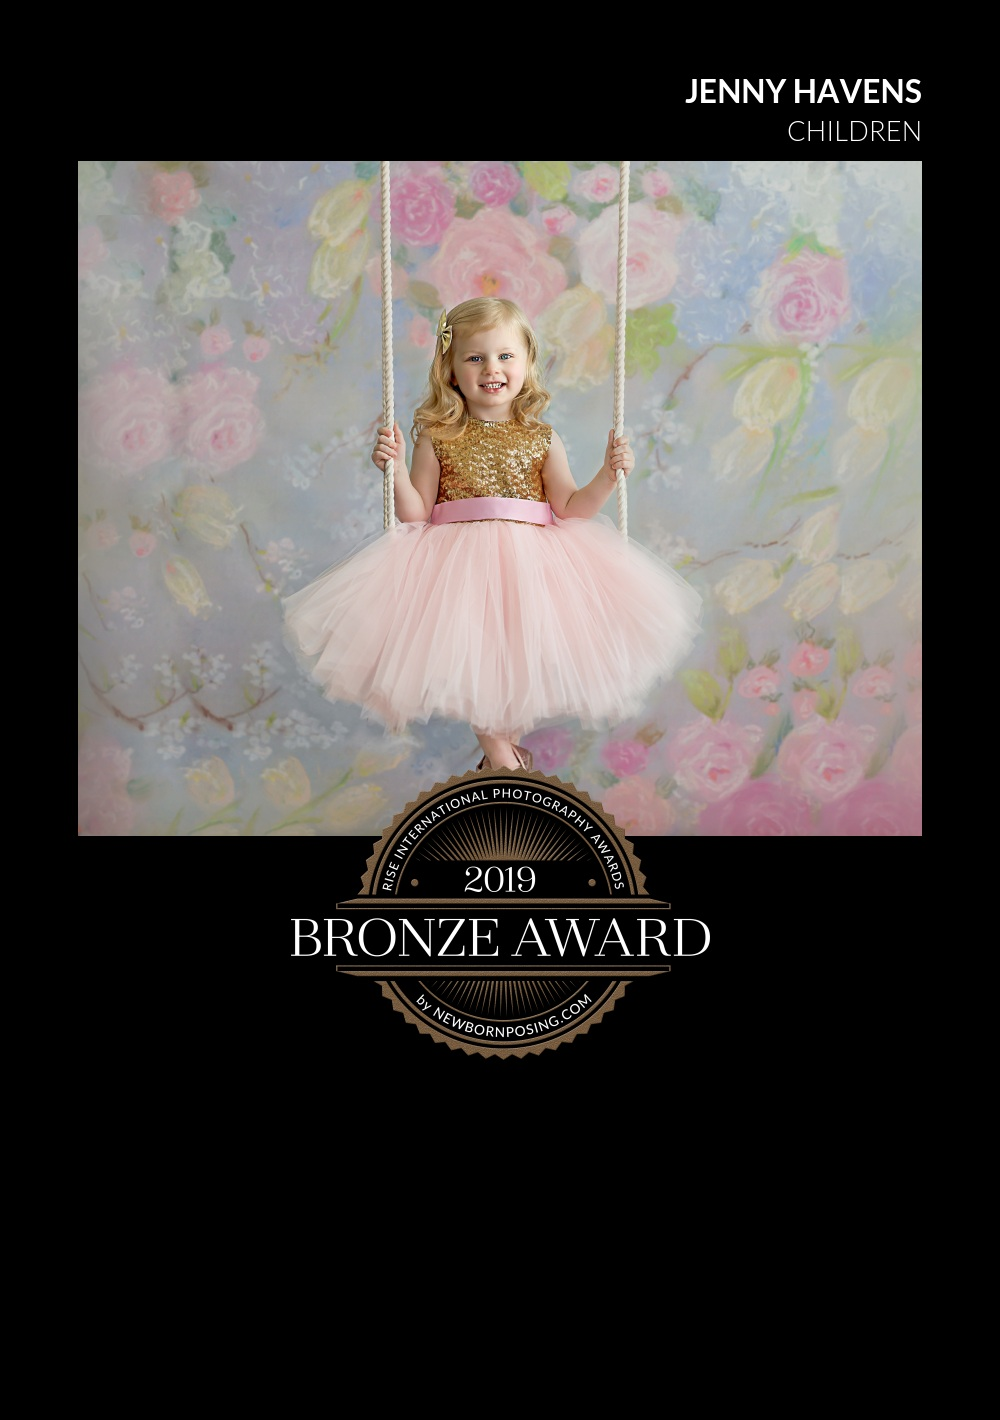 2019 Rise International Photography Award - Bronze Winner - Children Category -